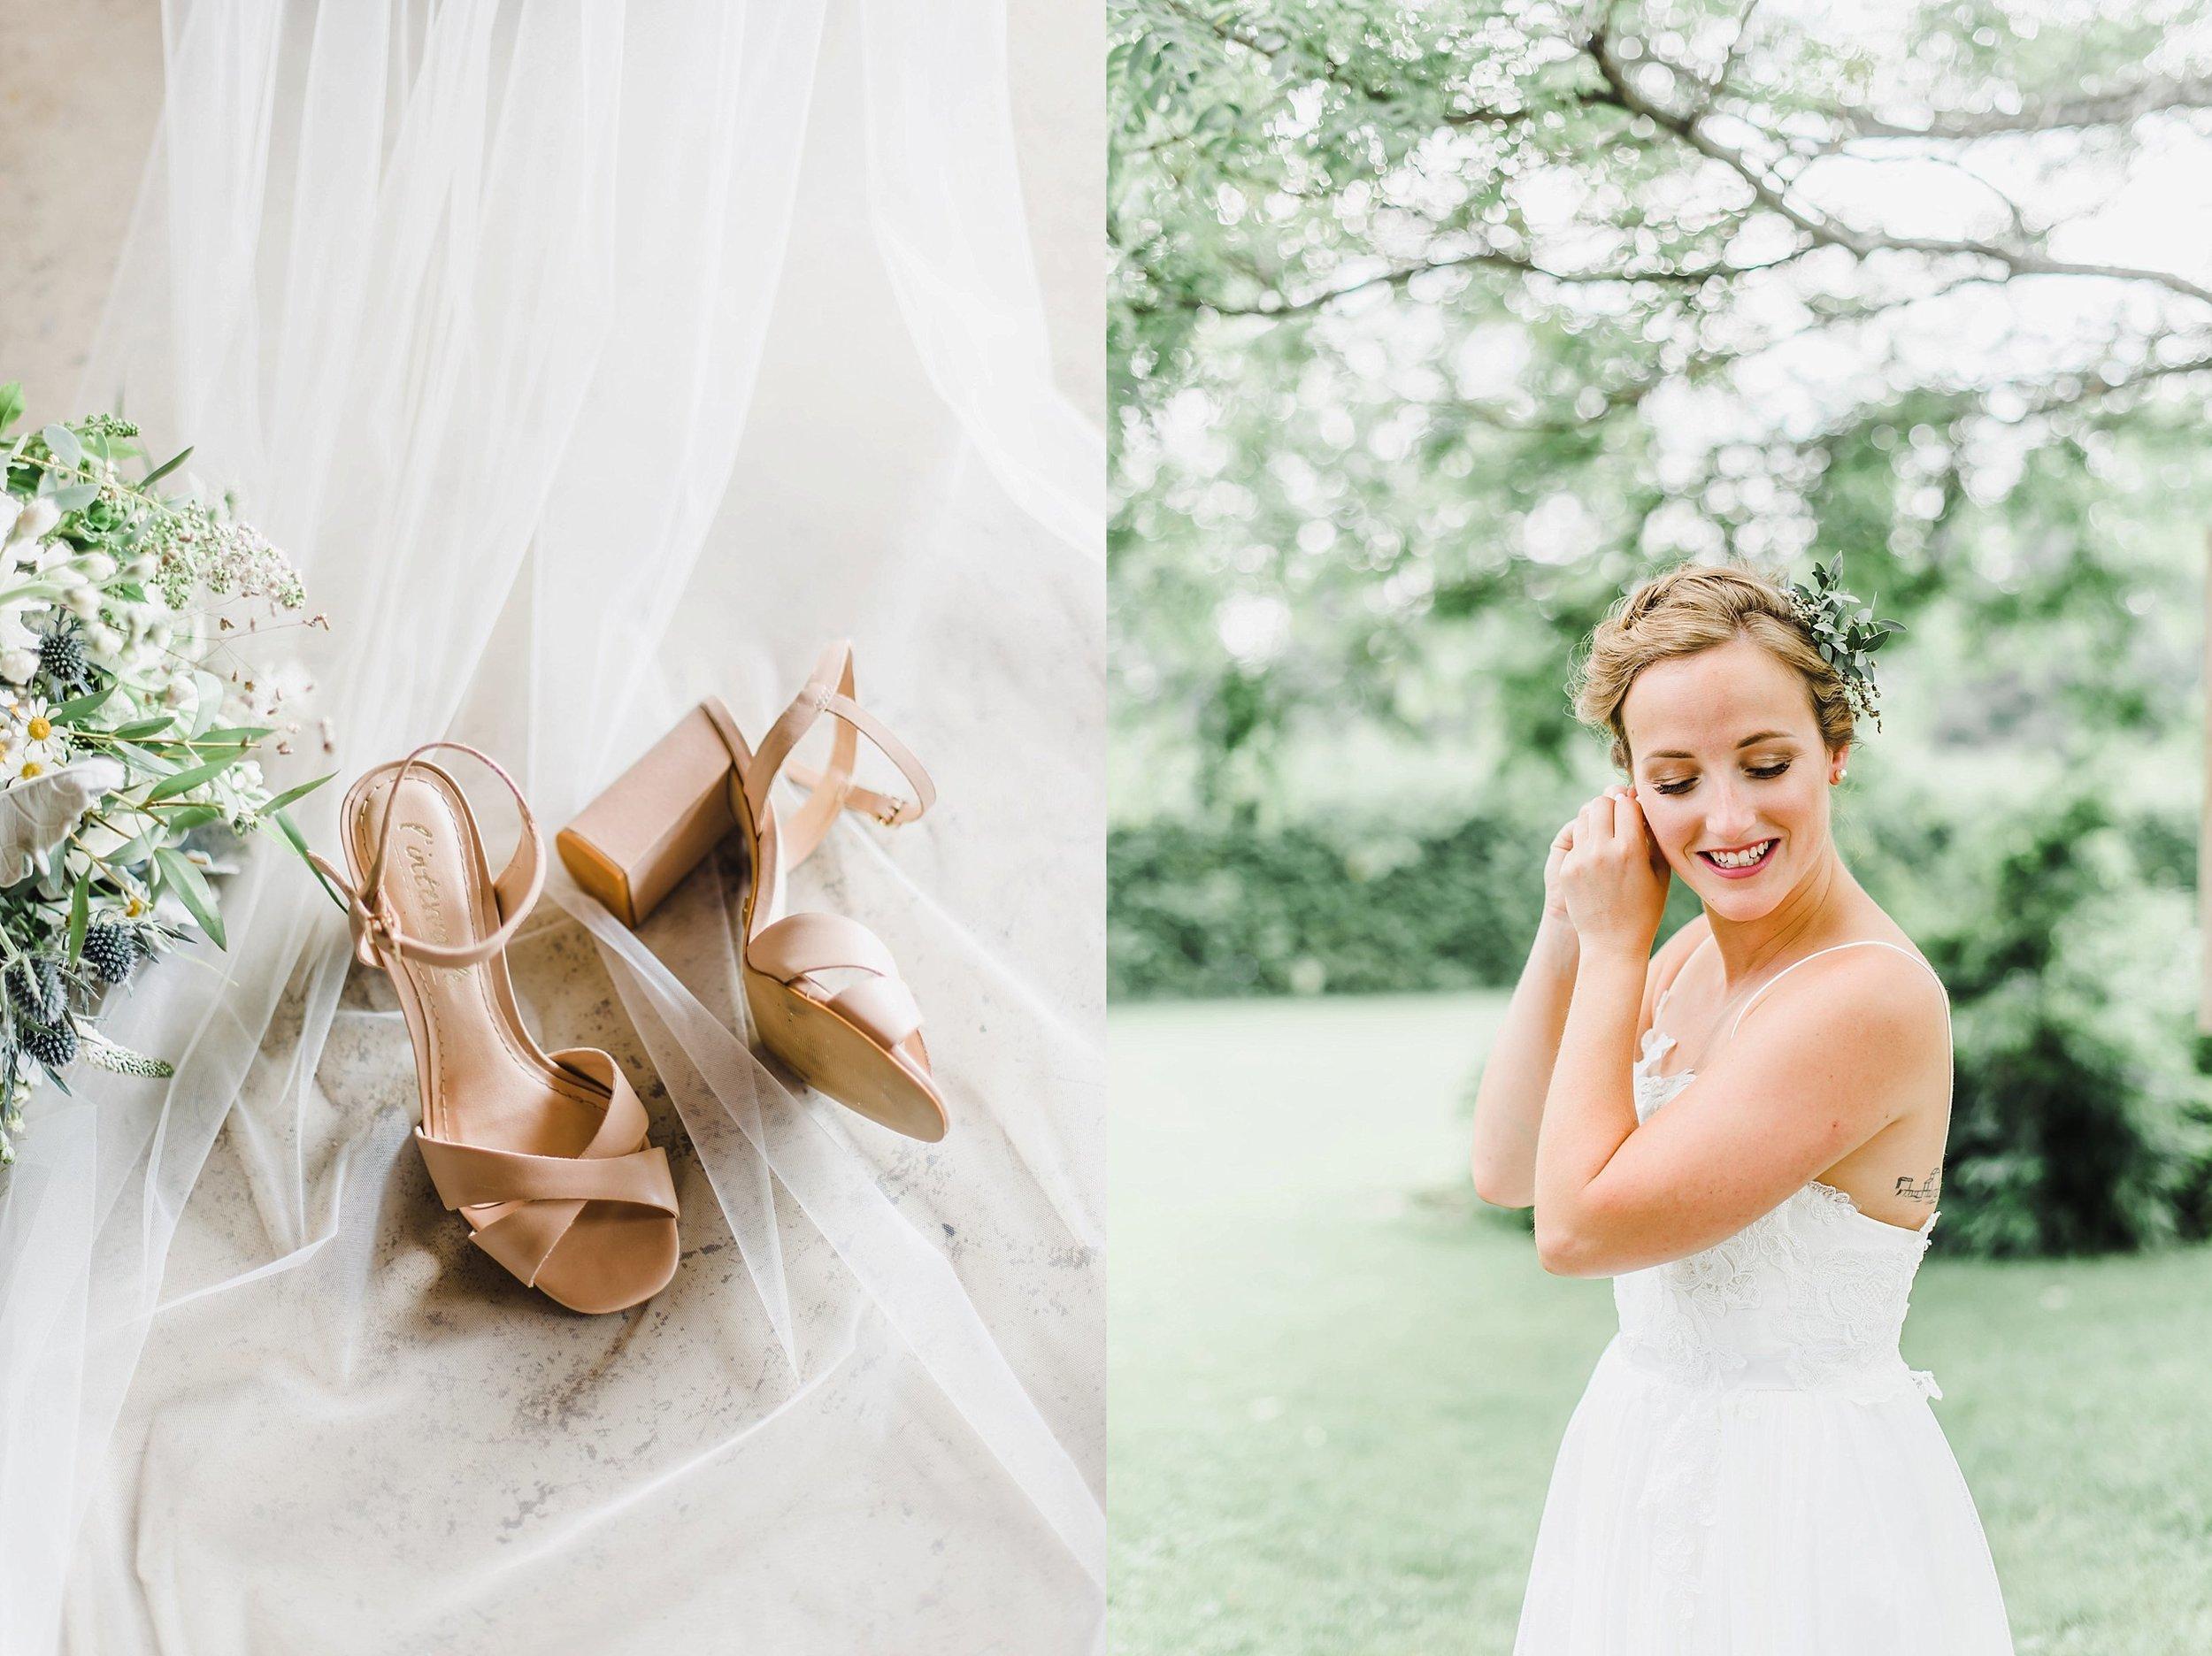 light airy indie fine art ottawa wedding photographer | Ali and Batoul Photography_0792.jpg